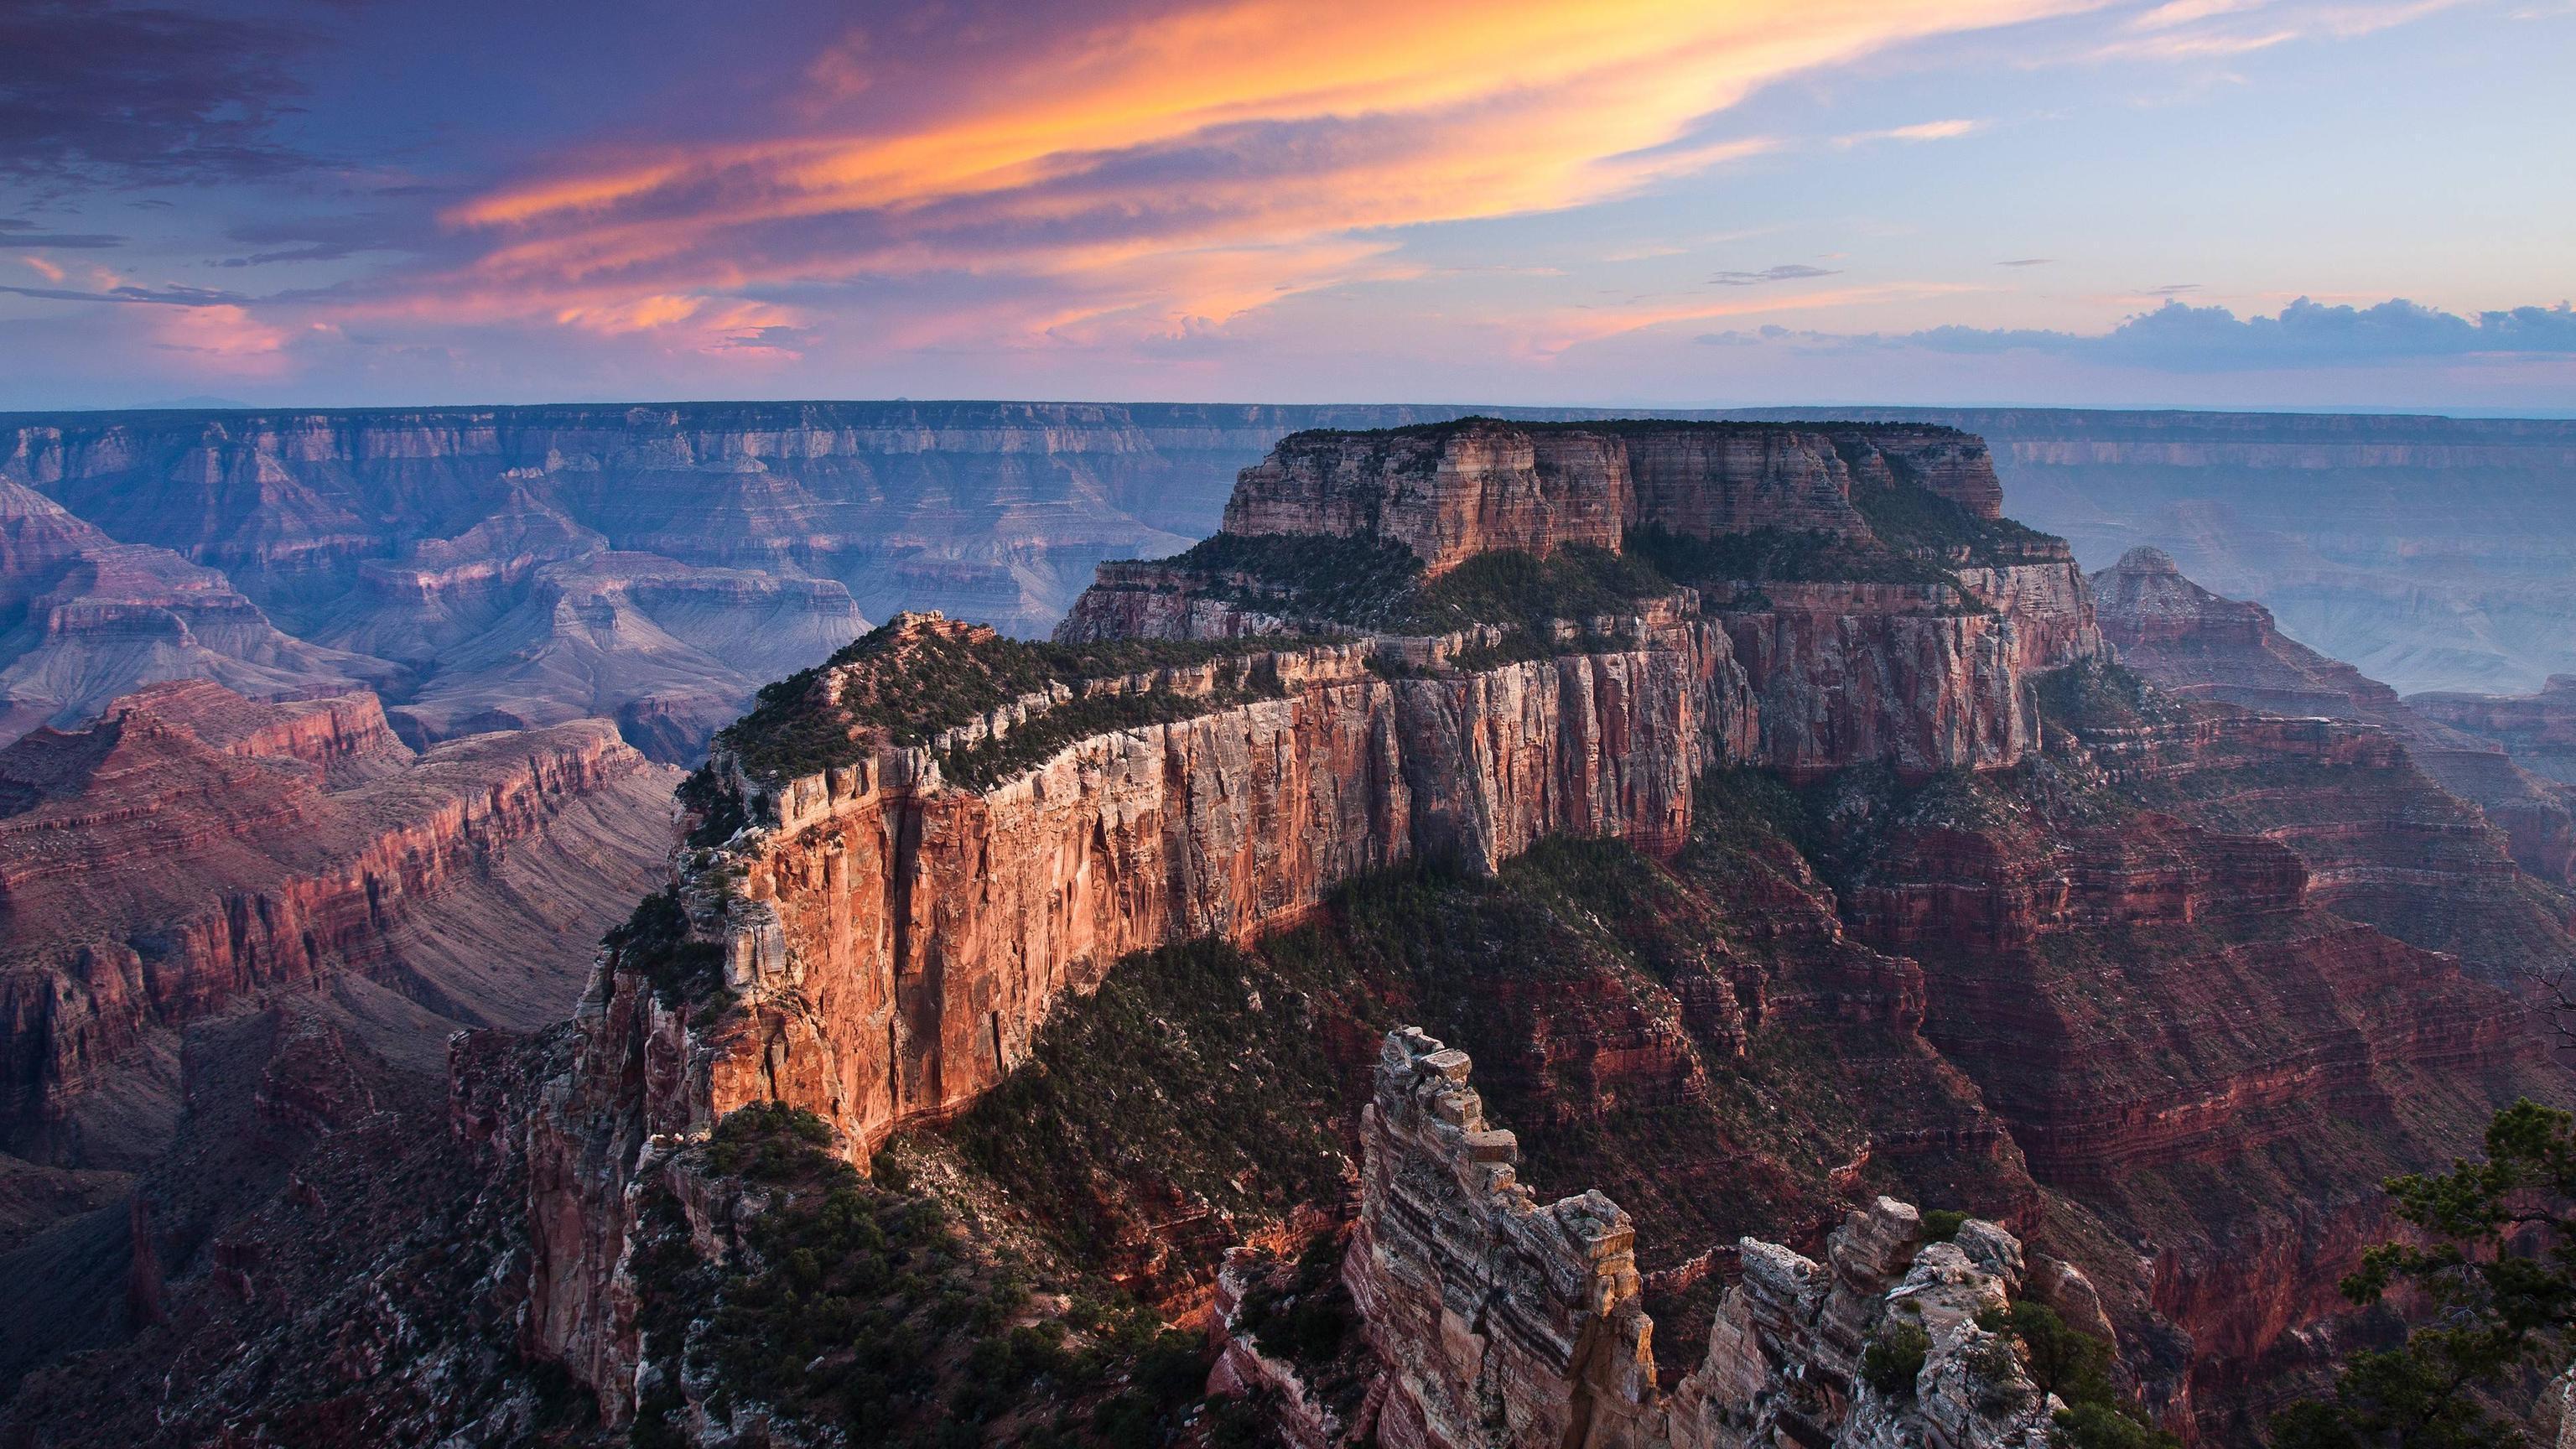 grand canyon 1920x1080 wallpaper - photo #21